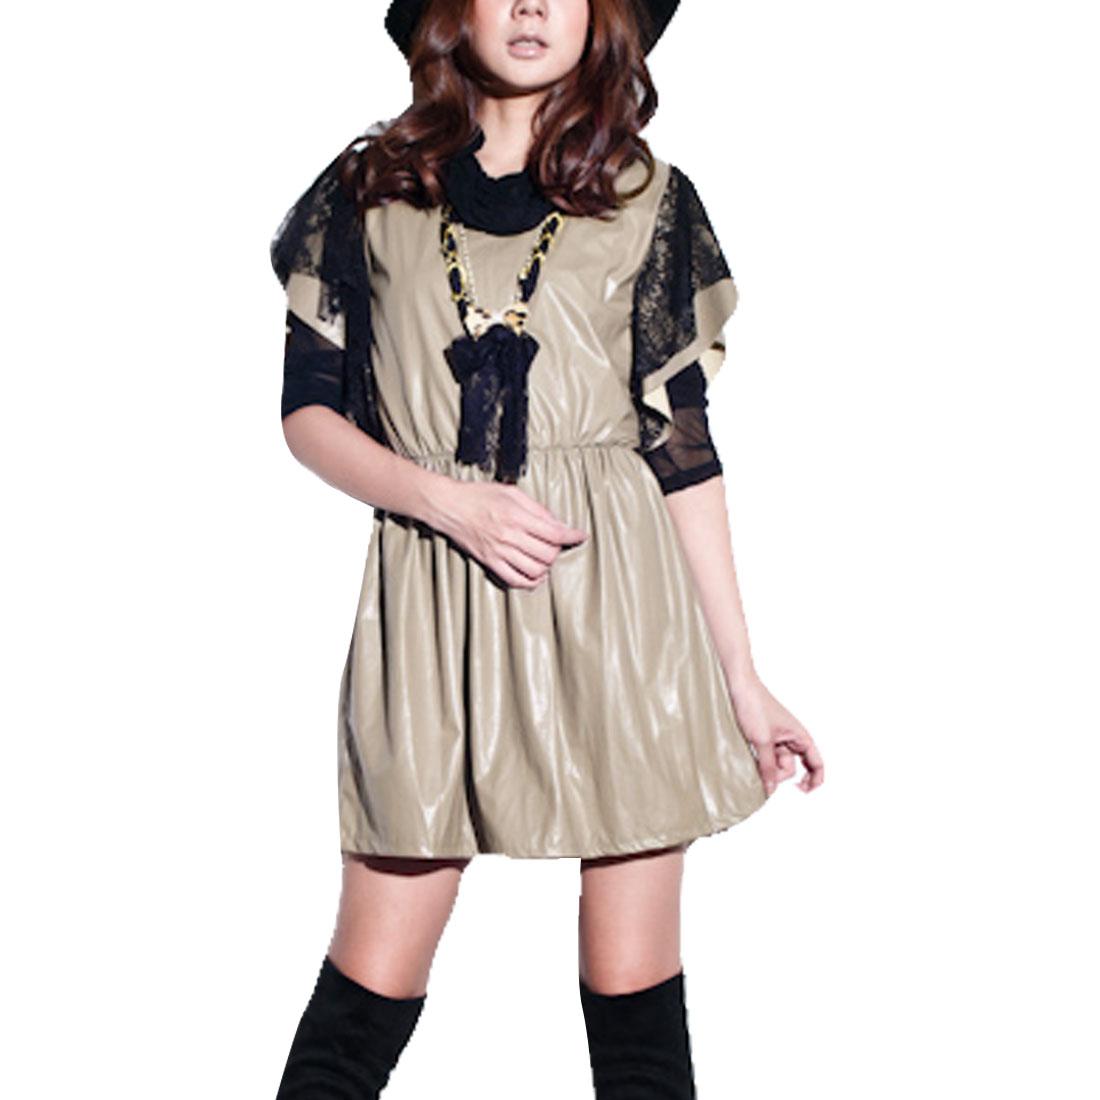 Women Scoop Neck Black Lace Cover Flutter Sleeves Khaki Mini Dress XS